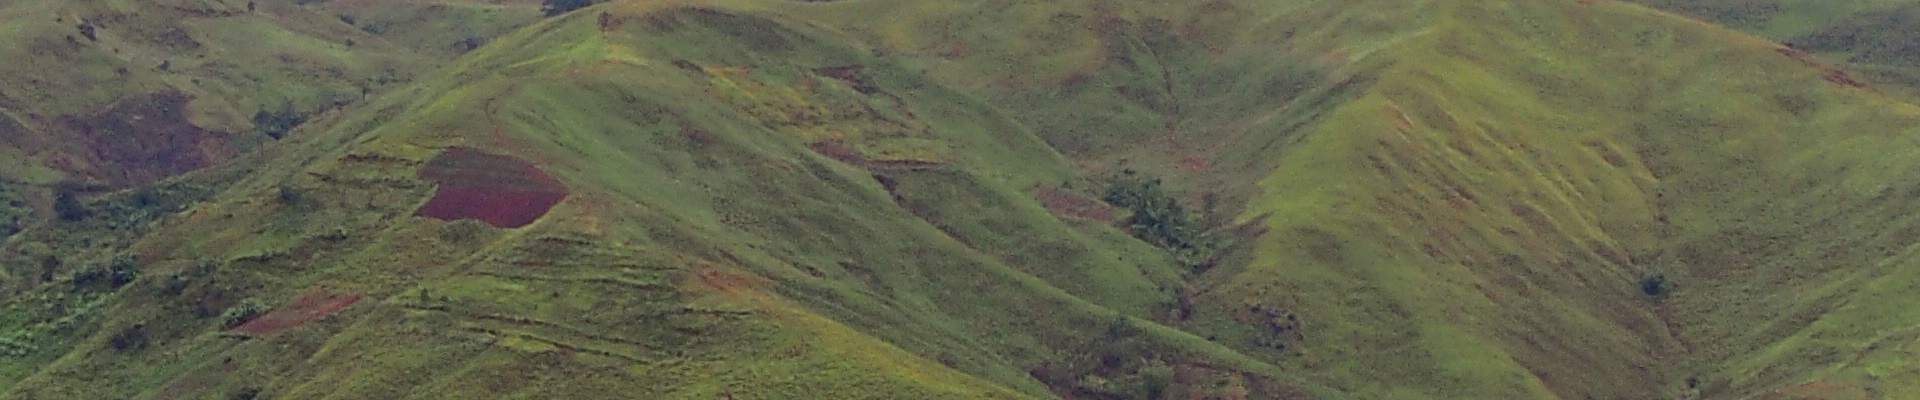 Integrated Natural Resource and Environmental Management Program